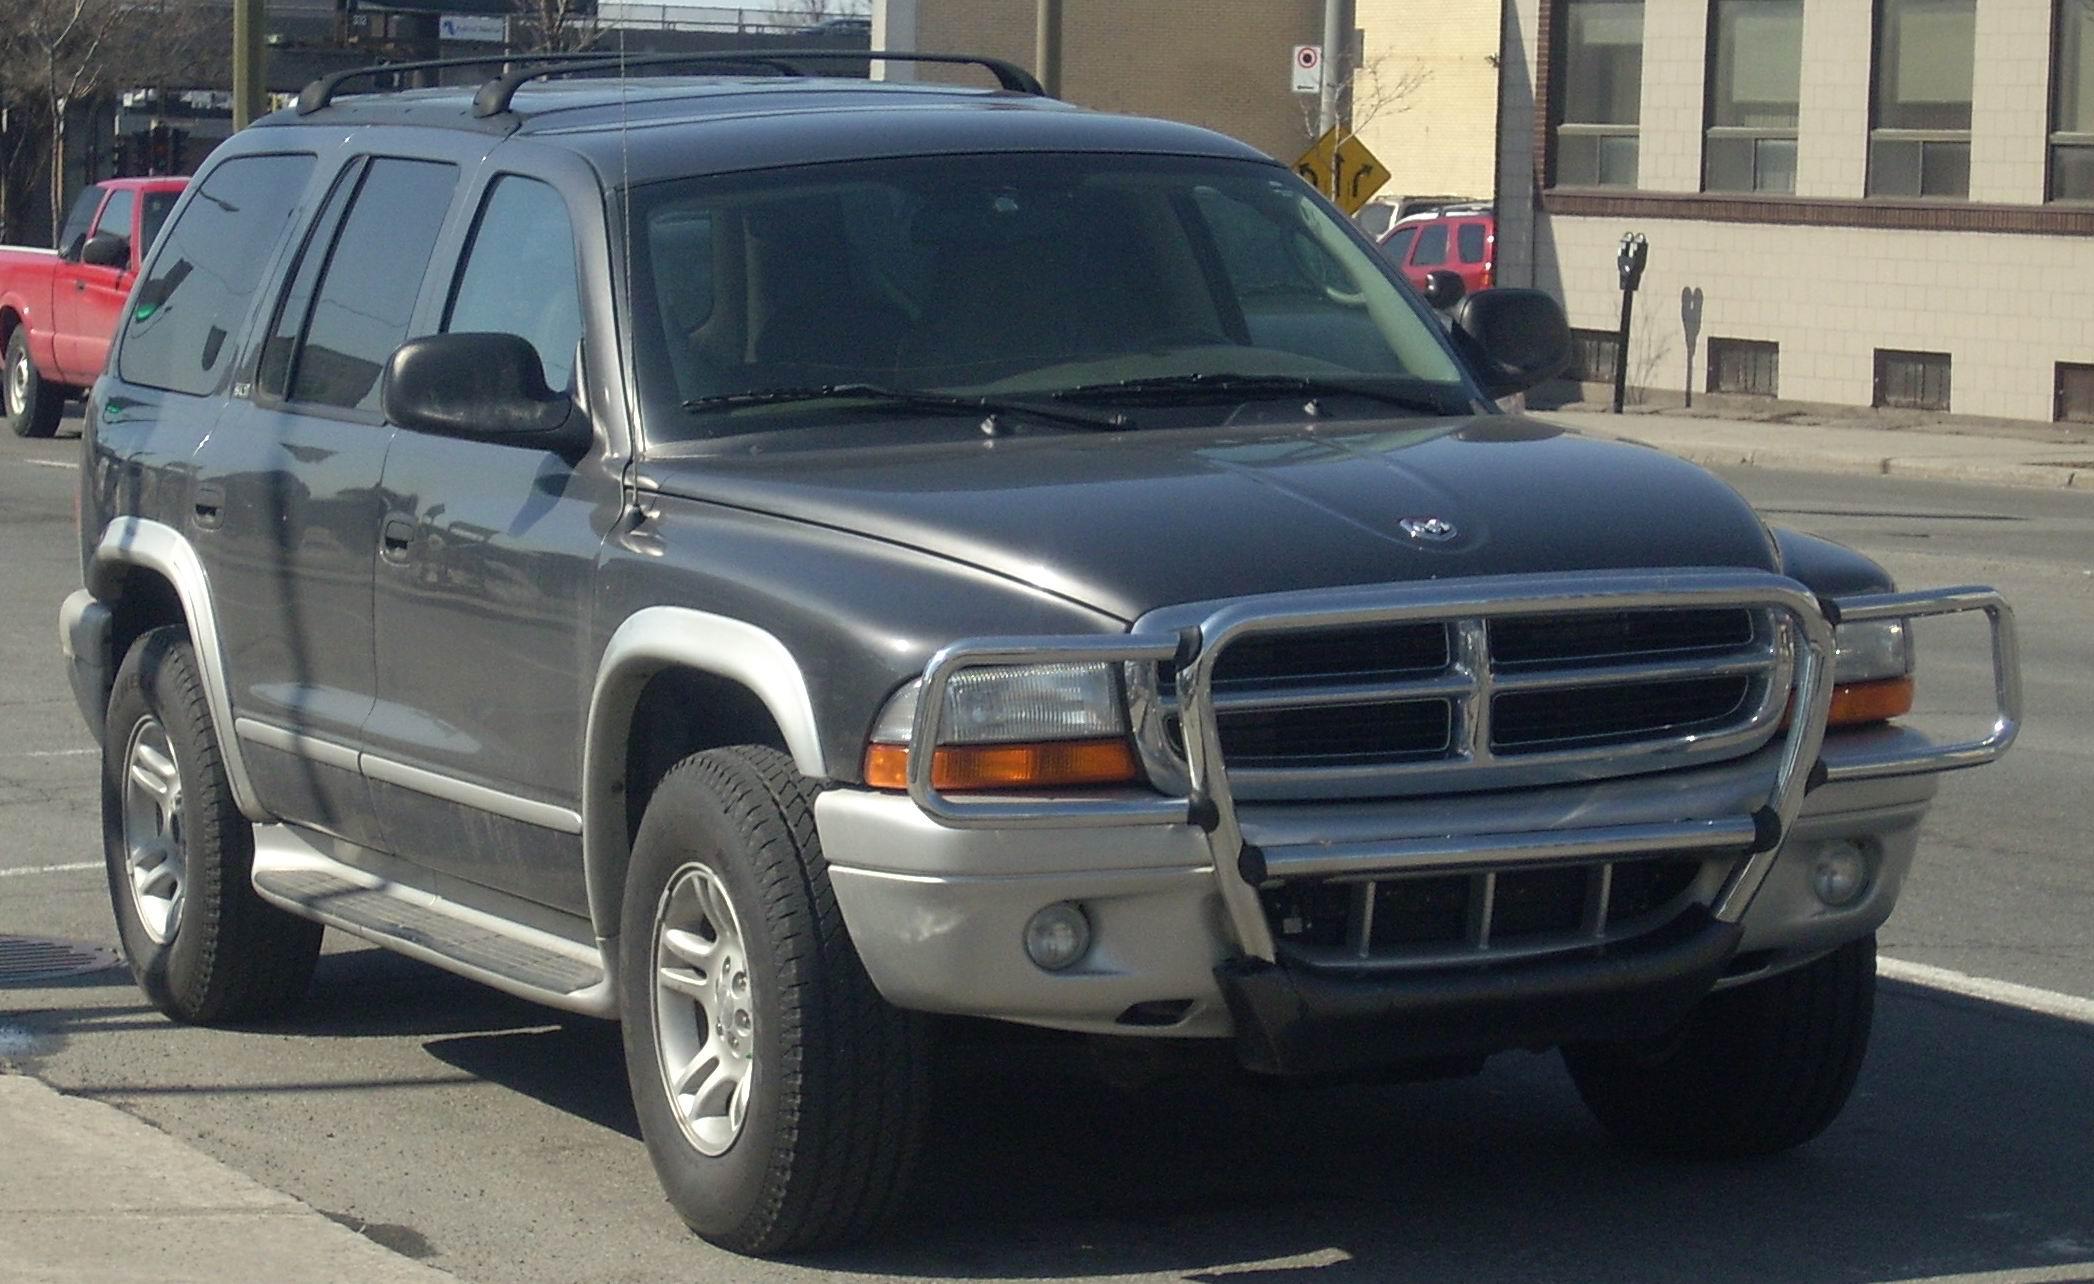 File:'01-'03 Dodge Durango SLT.JPG - Wikimedia Commons